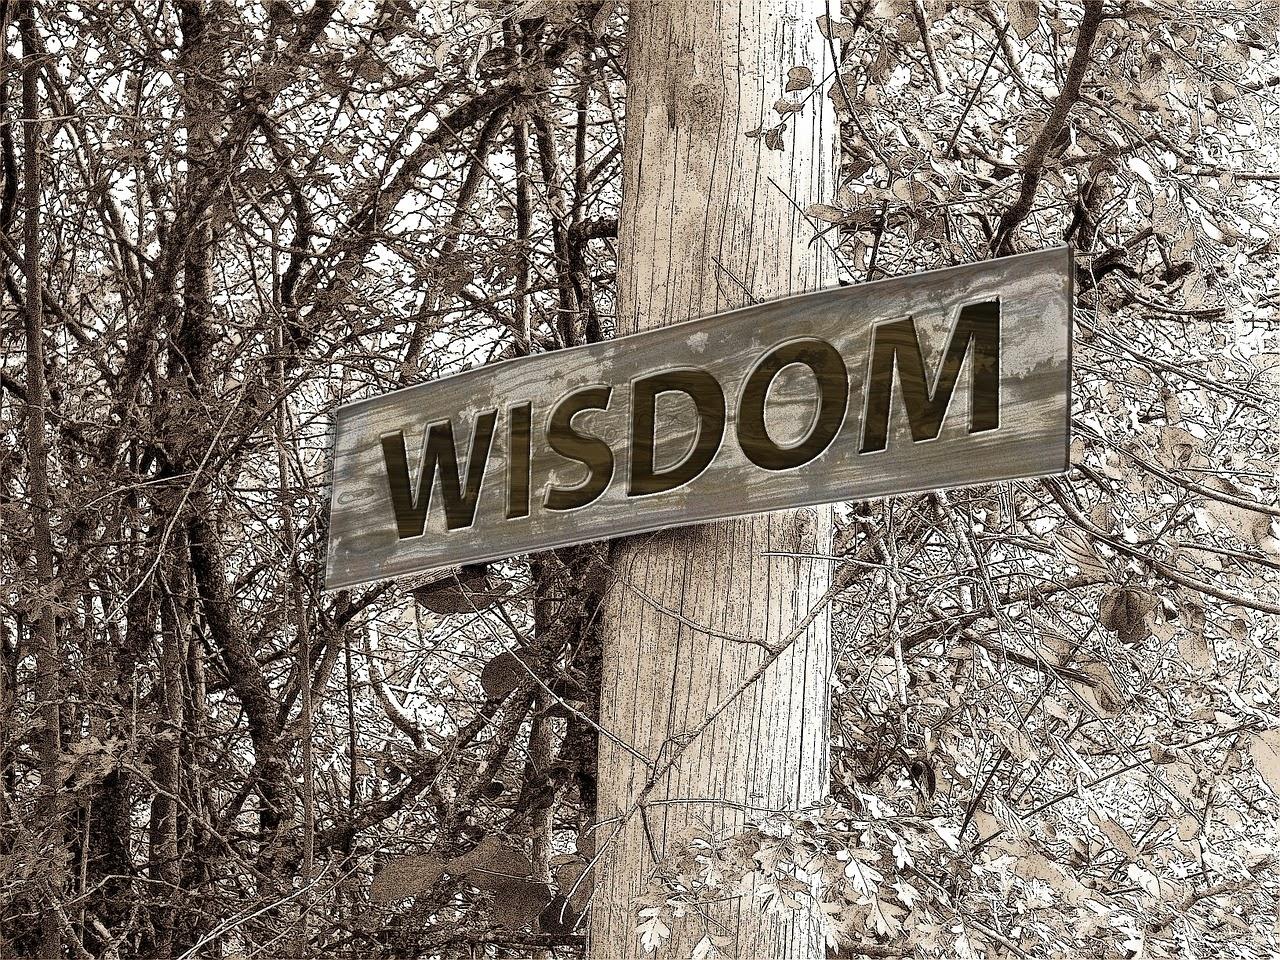 asking for wisdom/myclassacts.blogspot.com